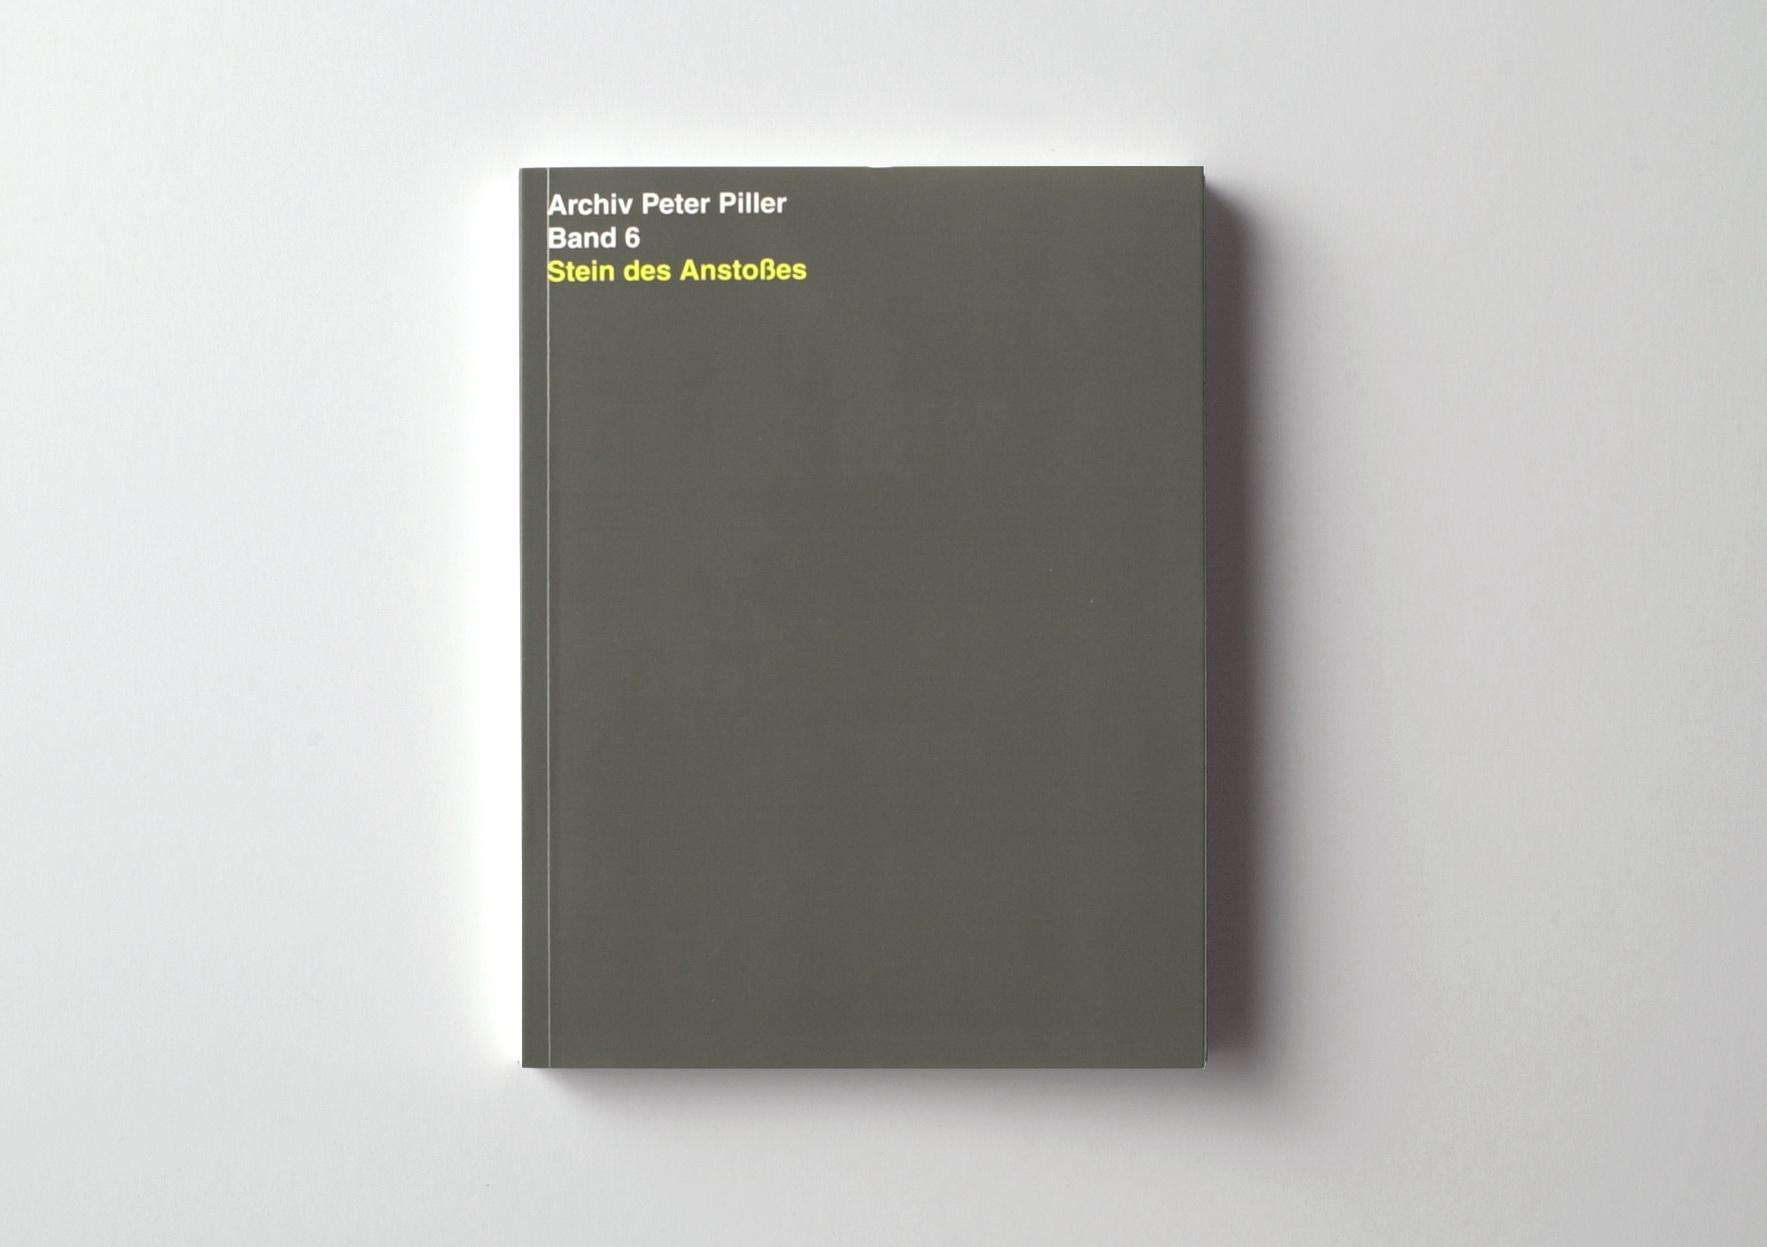   Archiv Peter Piller Bd. 6: Stein des Anstoßes   ProjecteSD